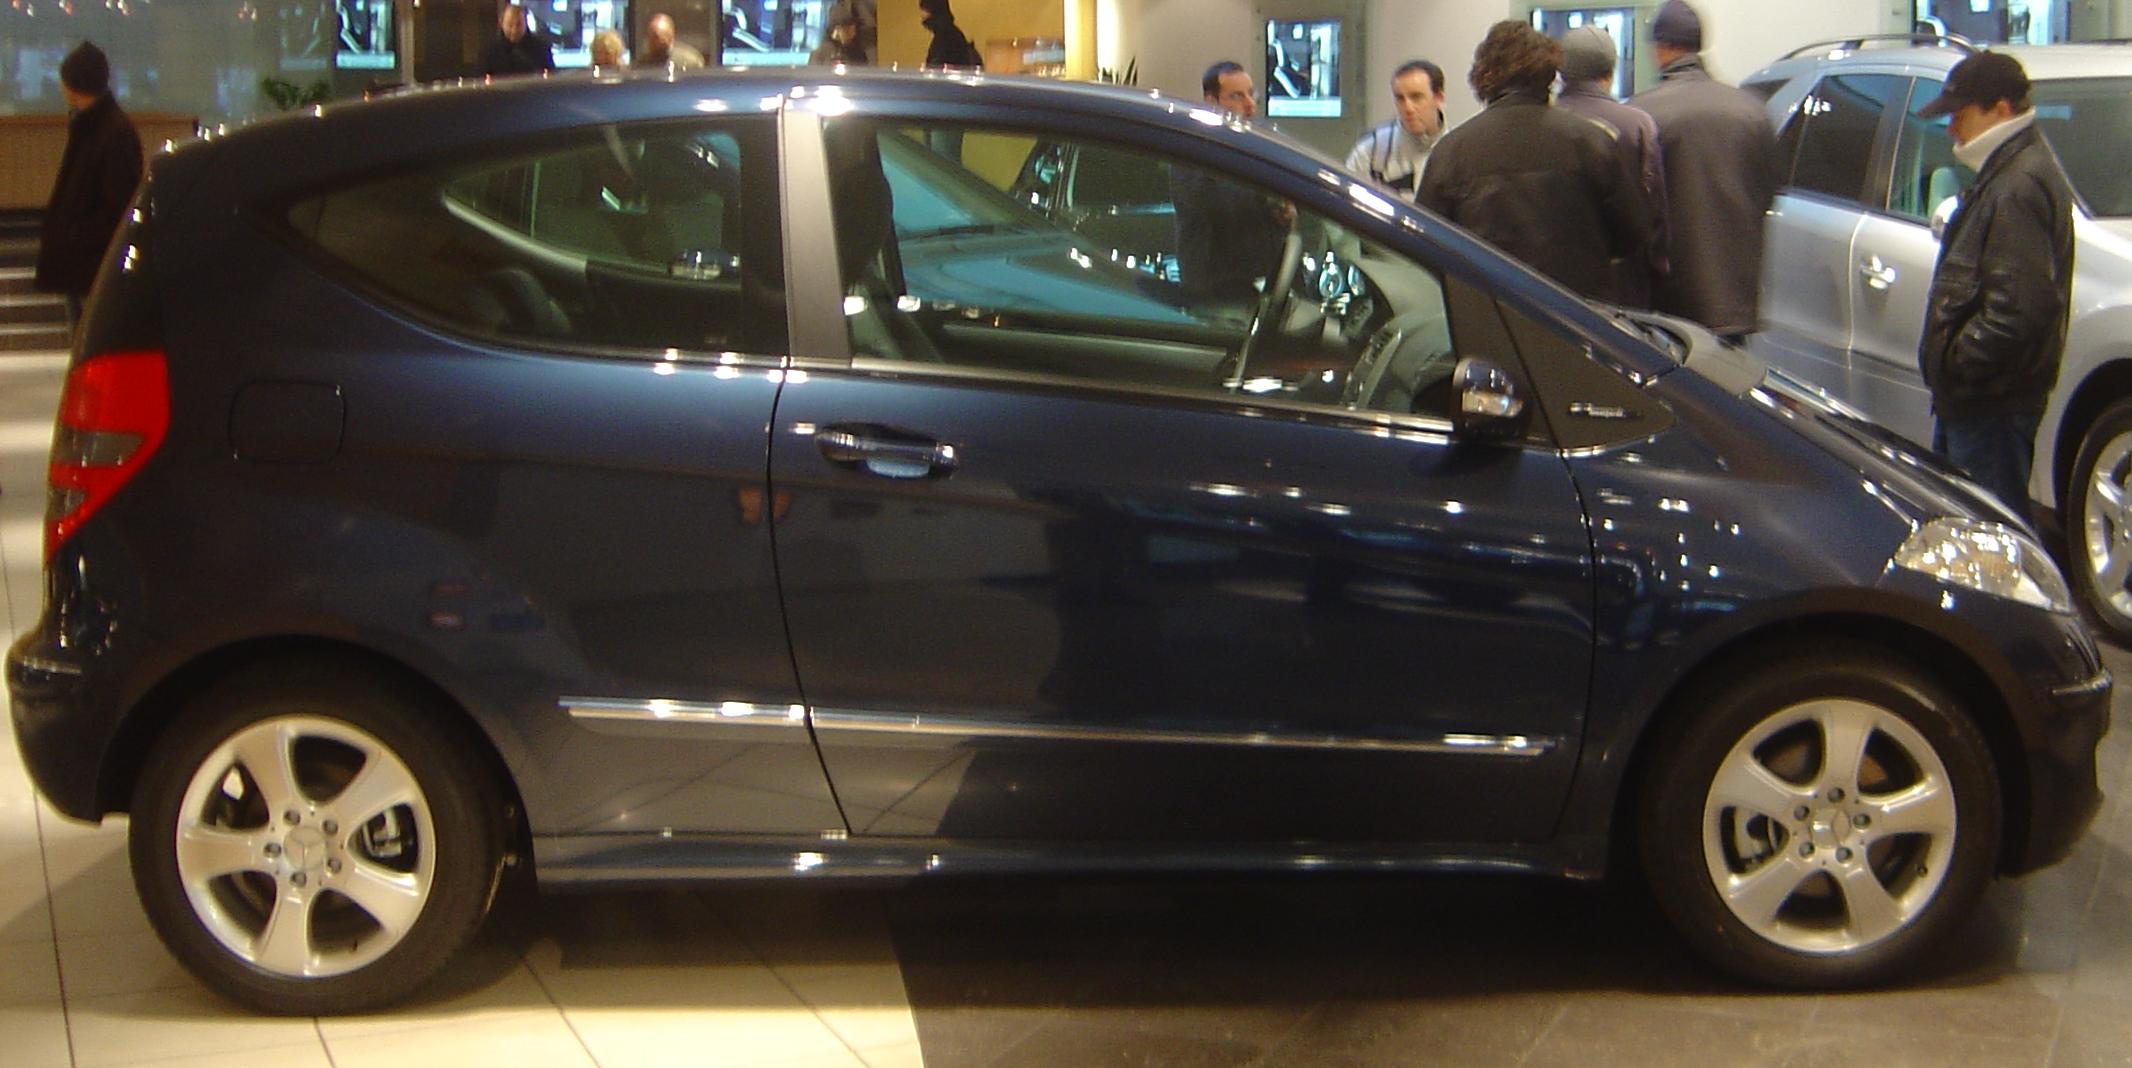 Schema Elettrico Mercedes Classe A W168 : Schema elettrico classe a w fare di una mosca